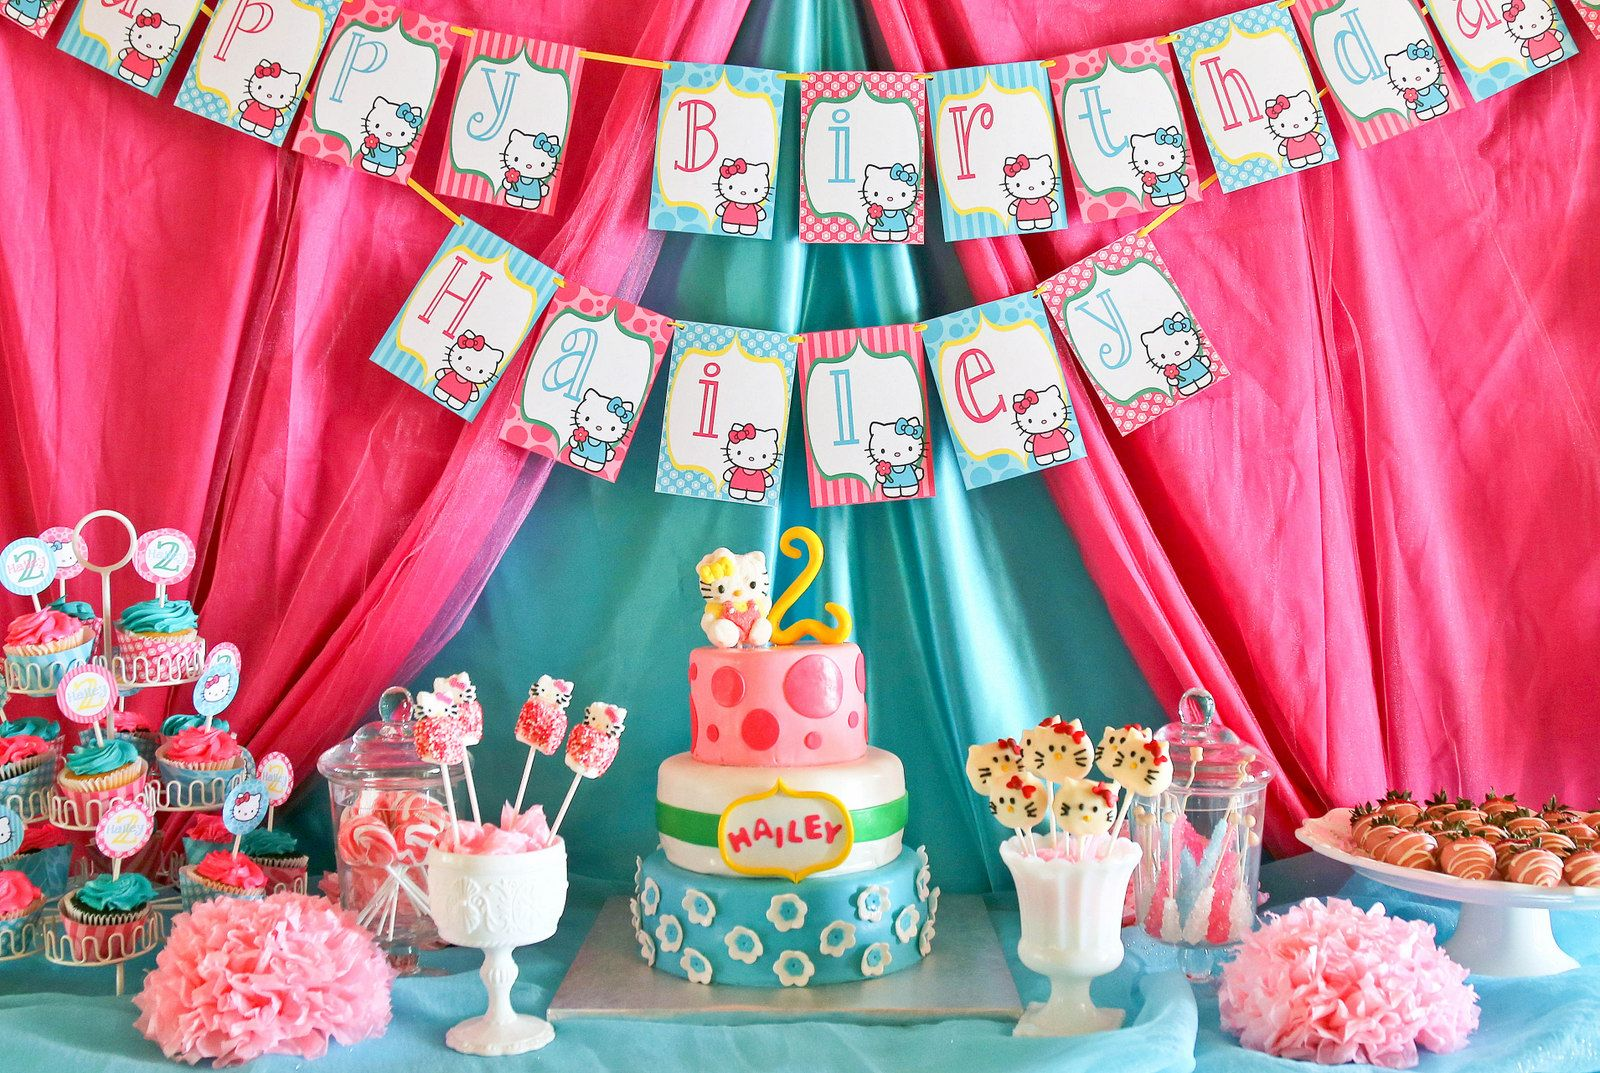 hello kitty birthday party ideas | Hello Kitty Party: Hailey's Hello Kitty Birthday